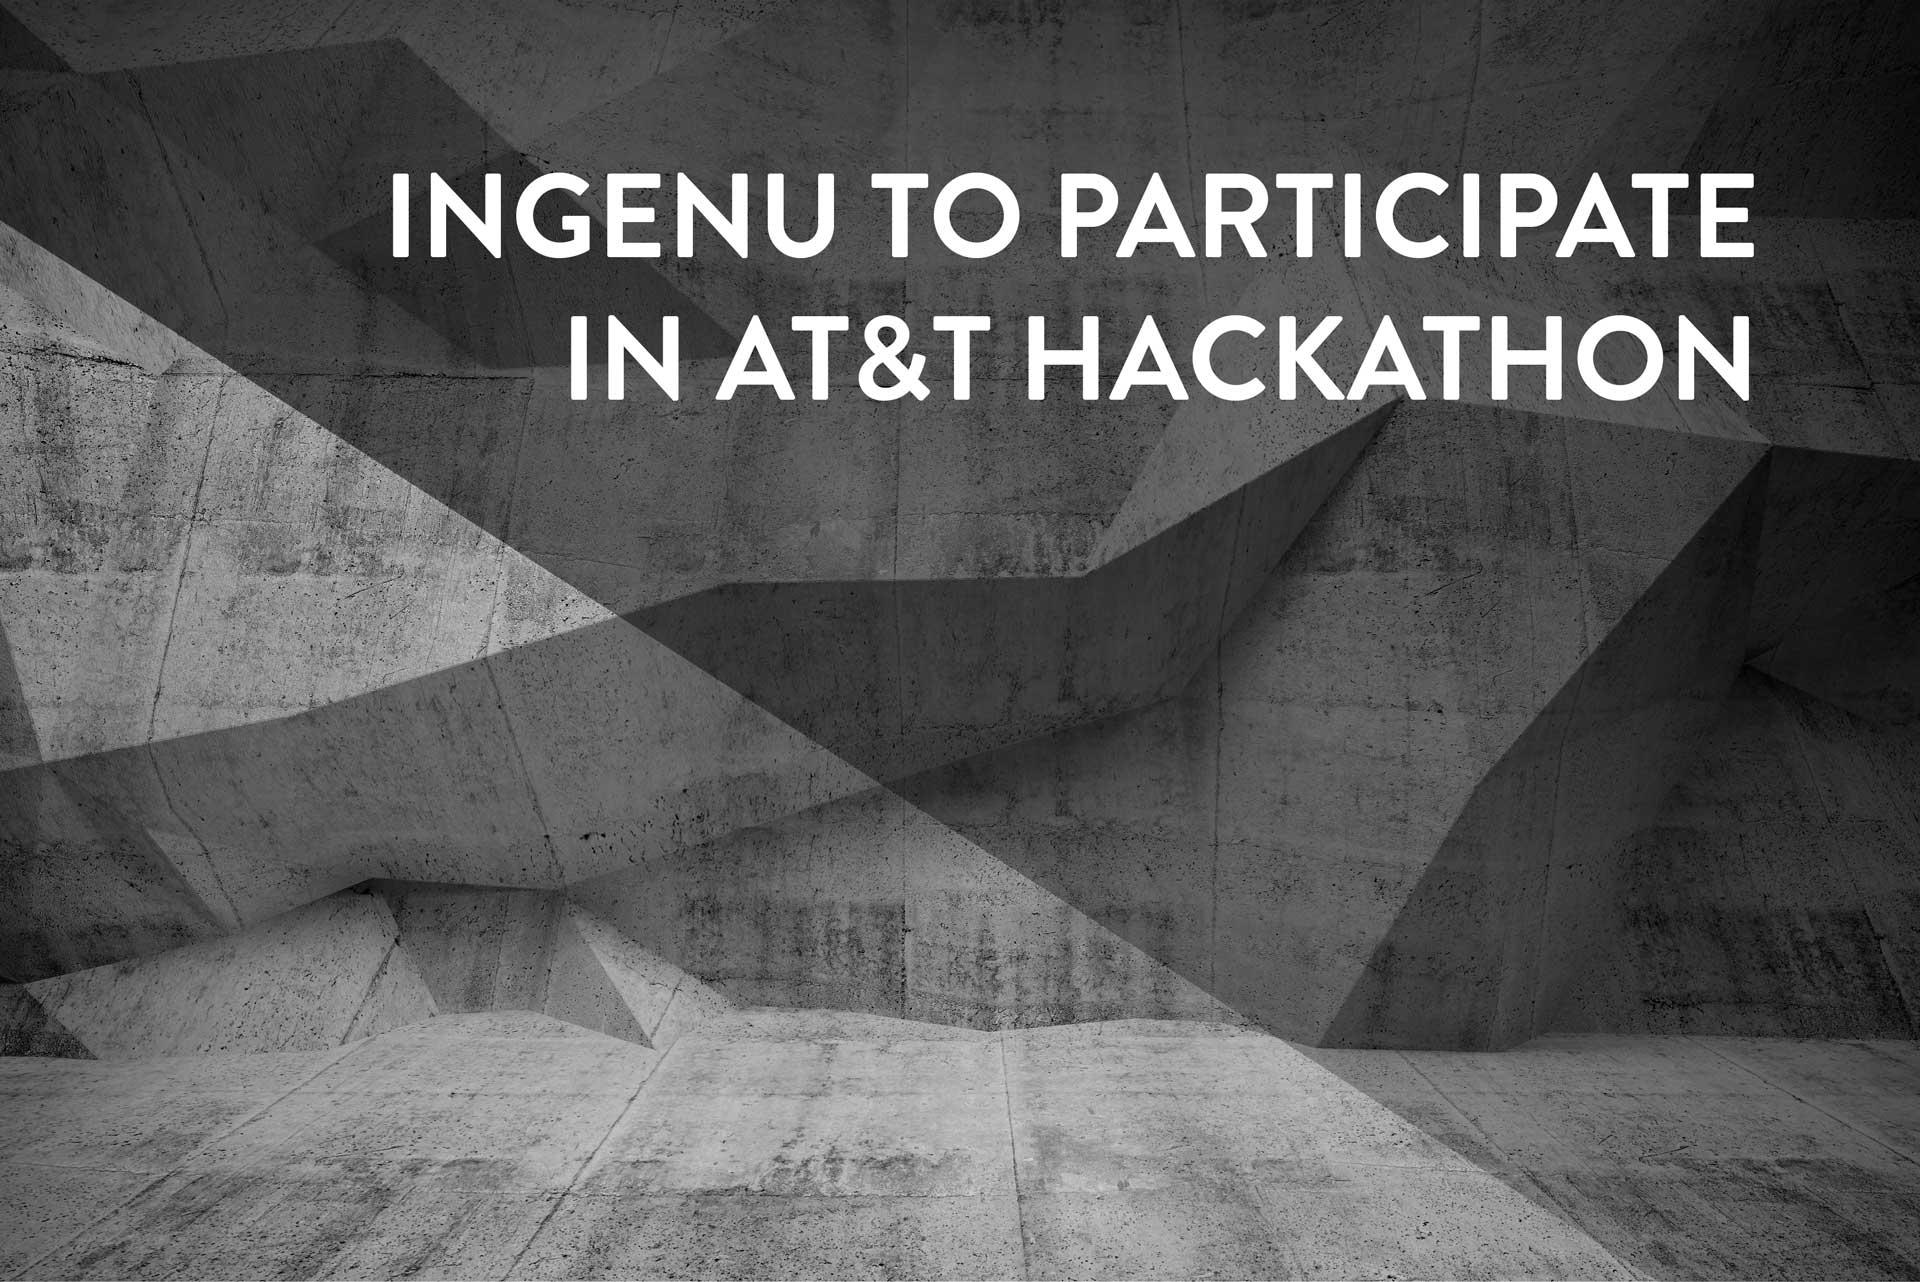 Ingenu to participate in AT&T hackathon